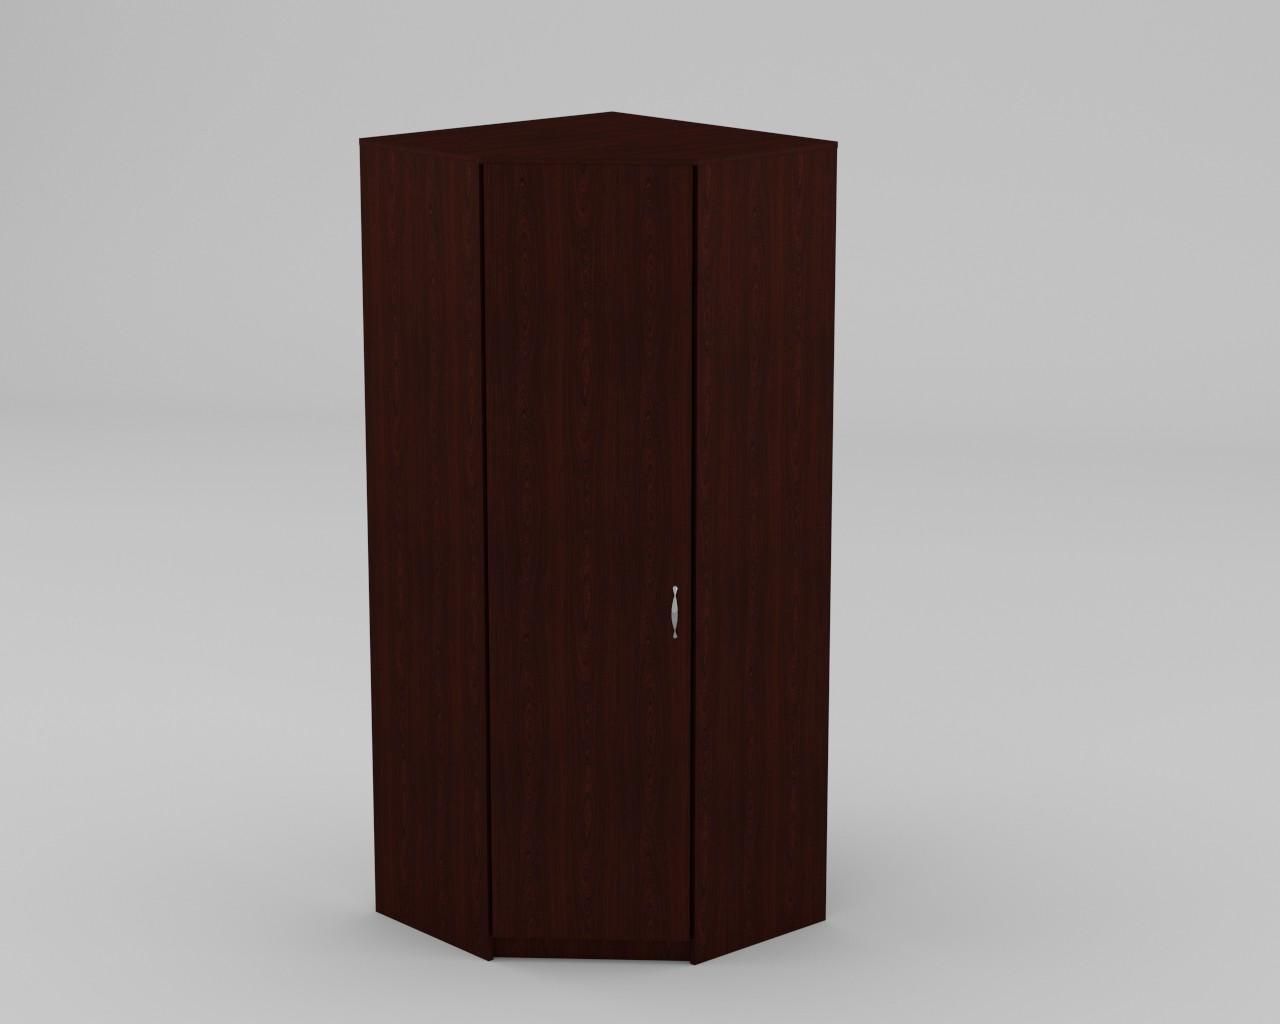 шкаф угловой из дсп своими руками